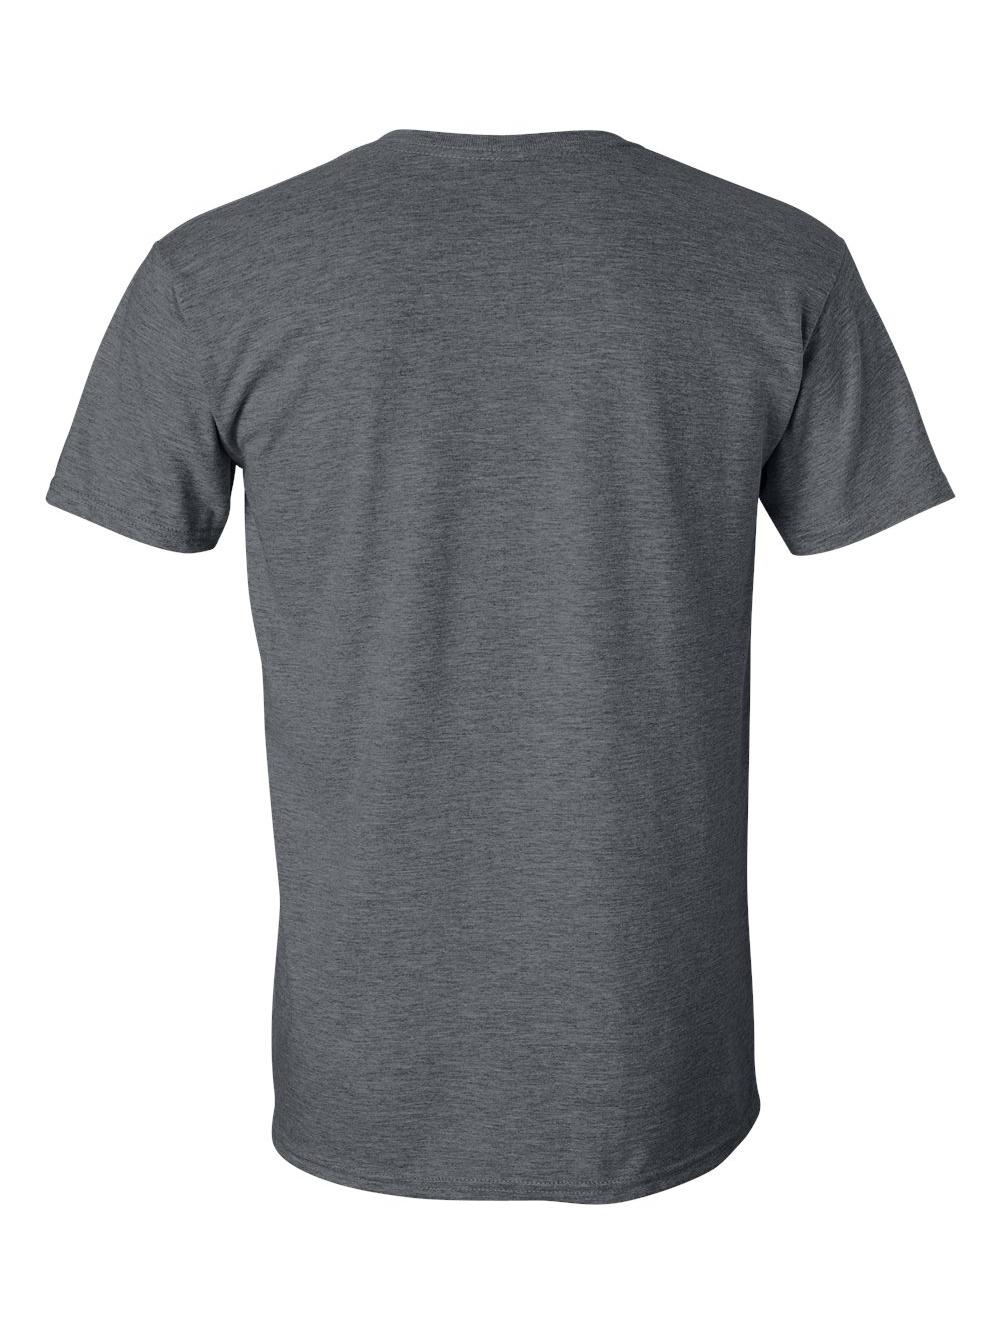 Gildan-Softstyle-T-Shirt-64000 thumbnail 49